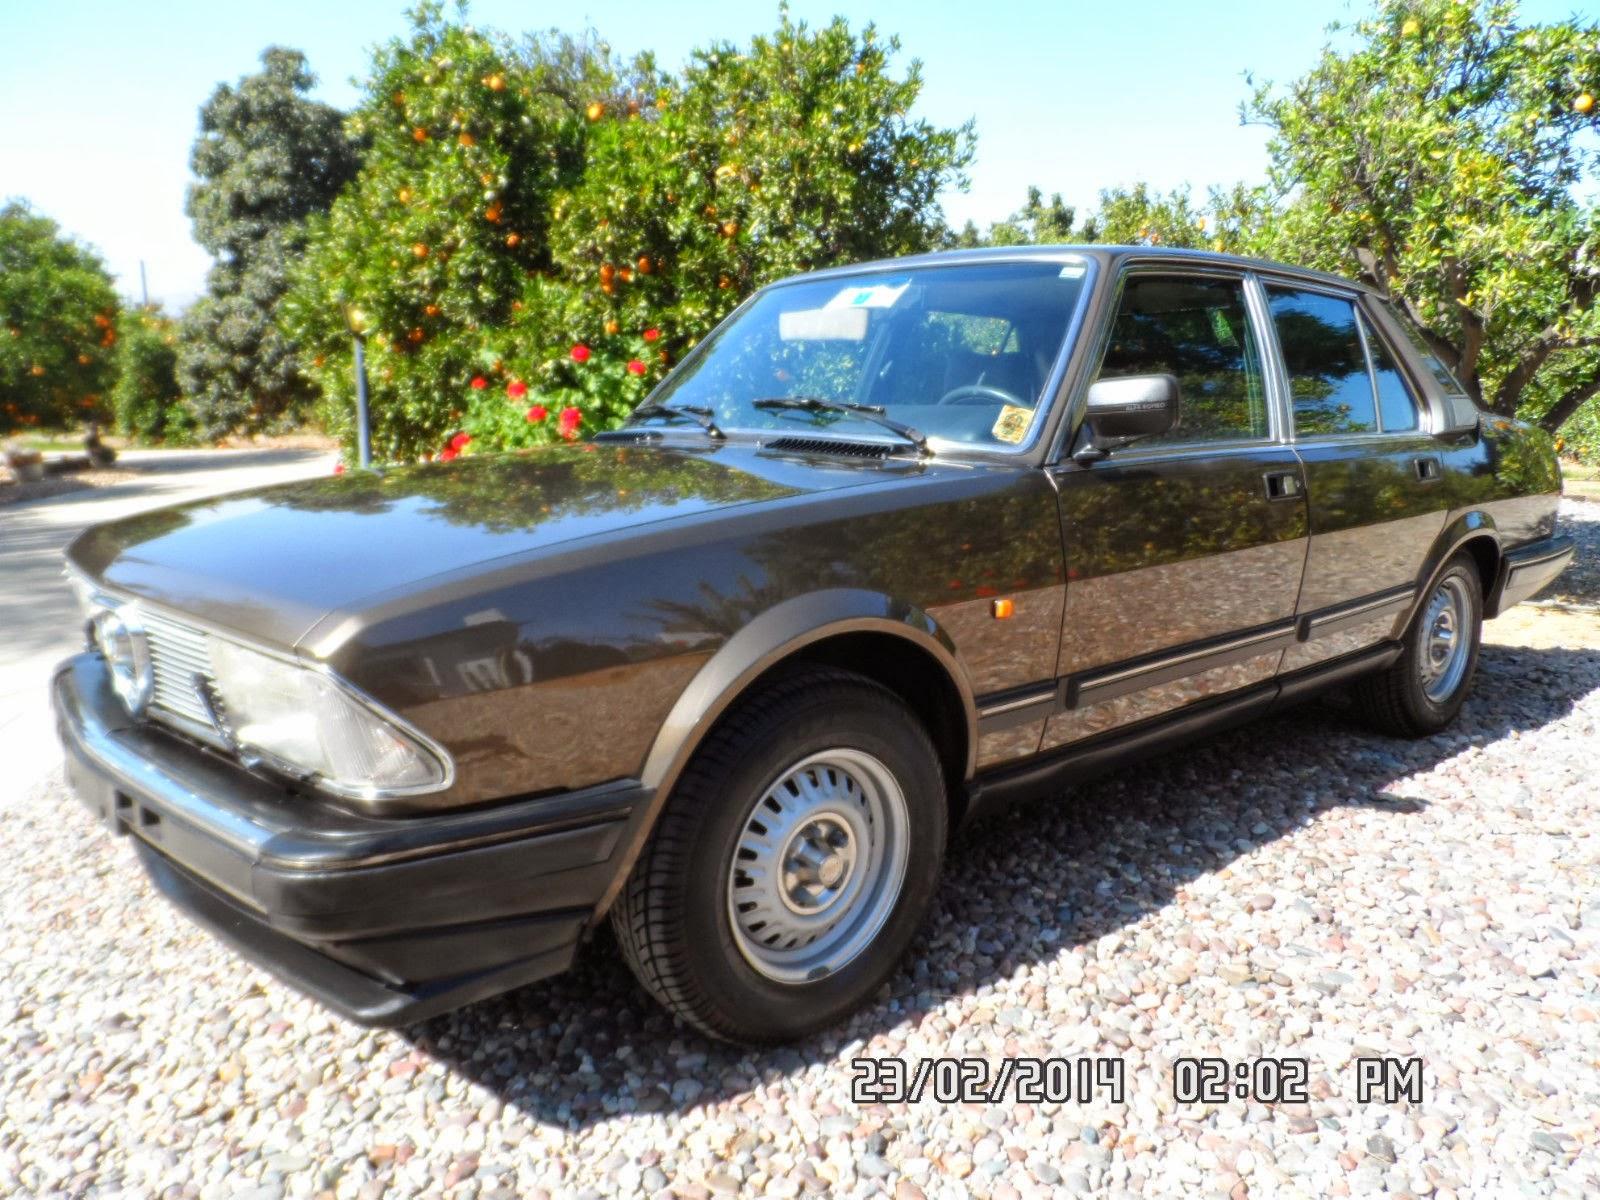 Just A Car Geek: 1985 Alfa Romeo Alfa 6 Turbodiesel - In the US ...